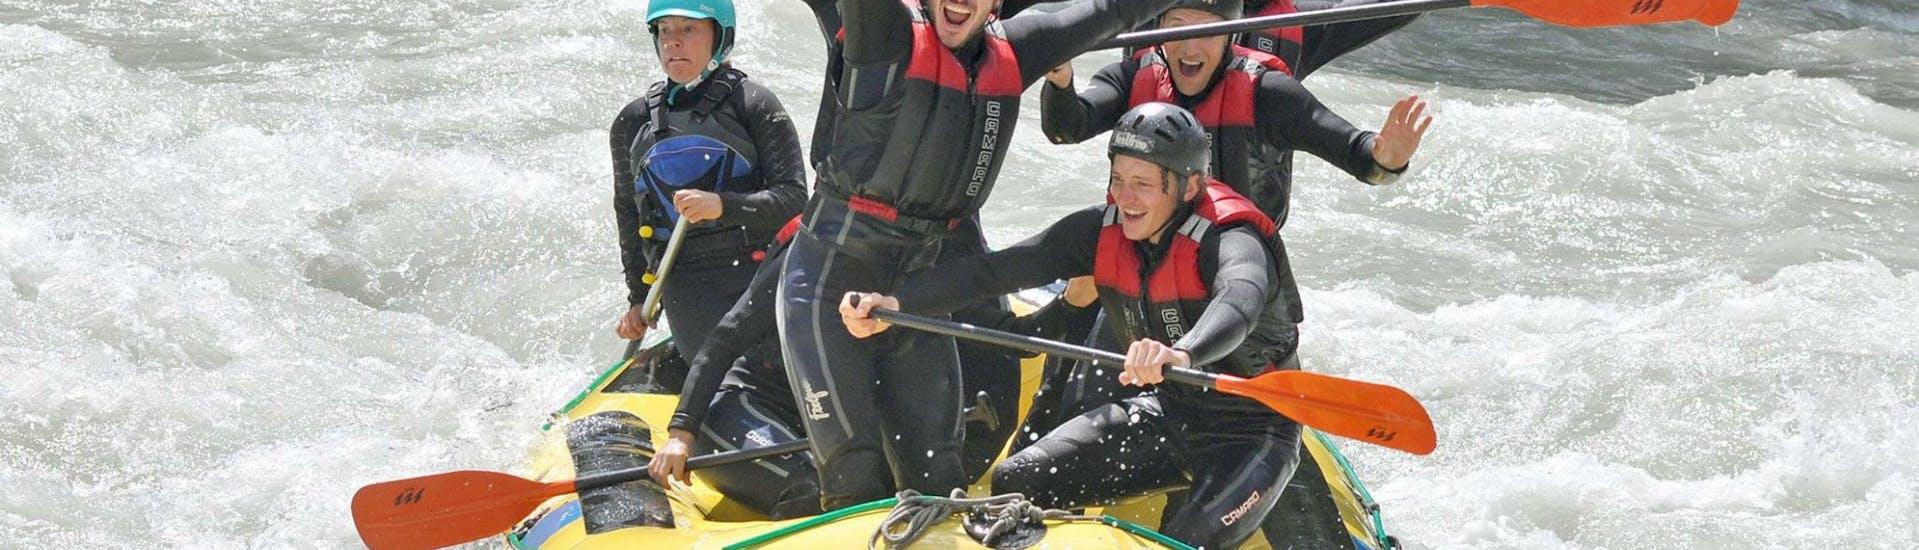 Rafting on Ötztaler Ache - White Water Professional Tour